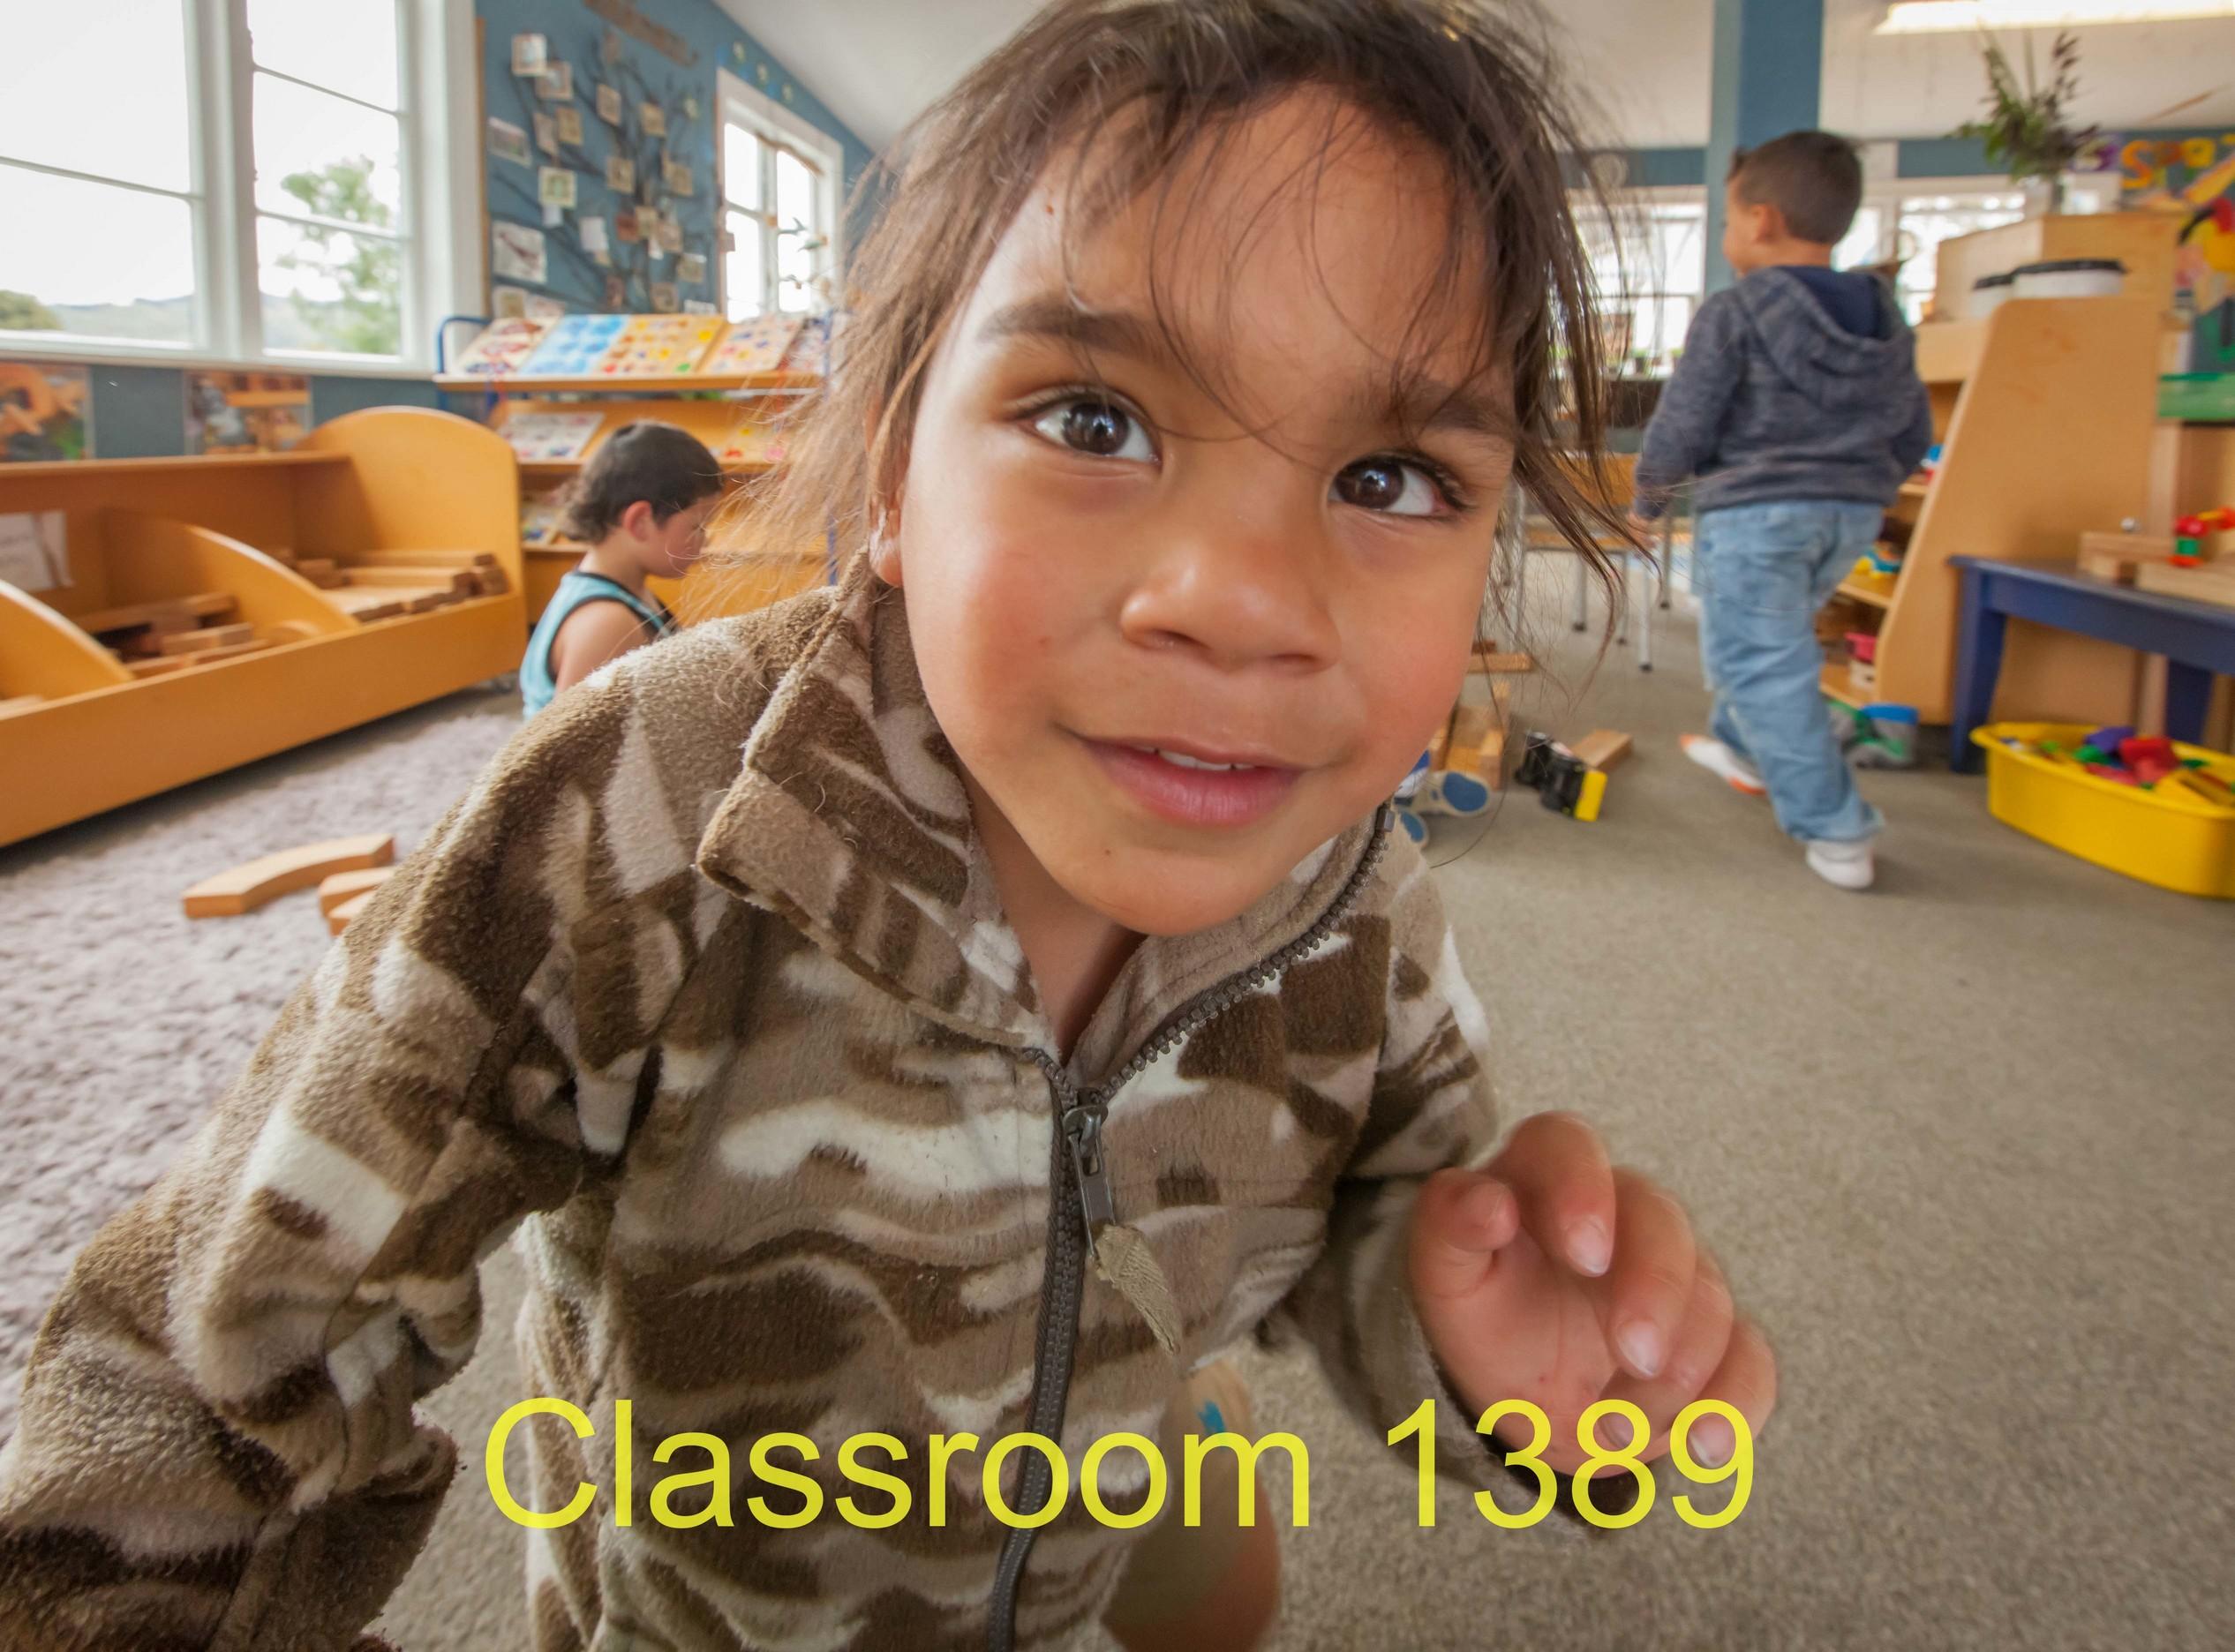 Classroom 1389